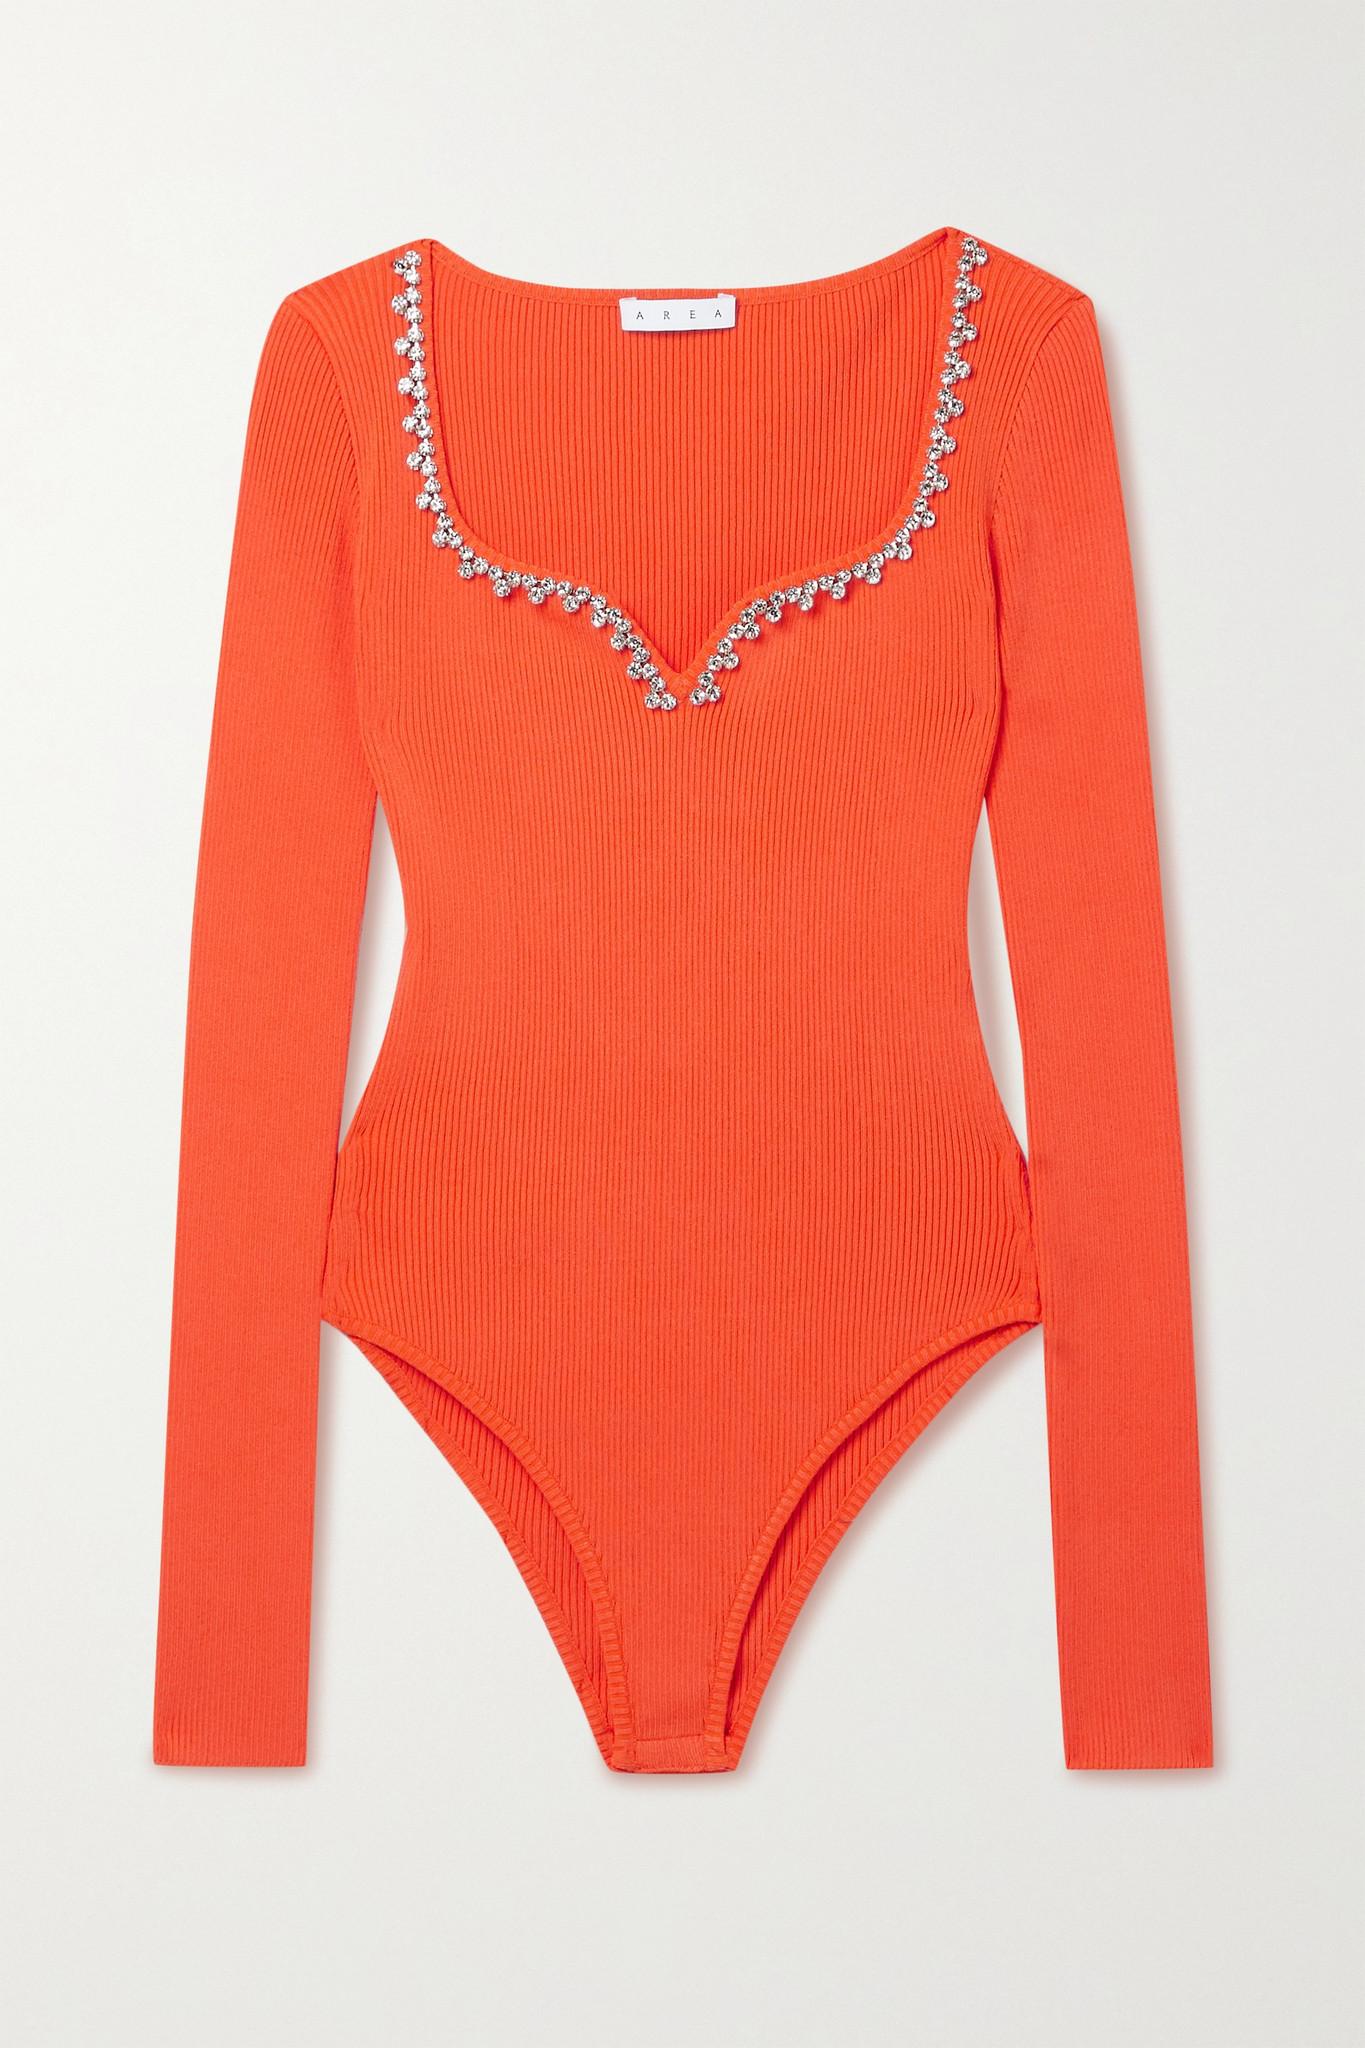 AREA - Crystal-embellished Ribbed Stretch-knit Bodysuit - Orange - x small